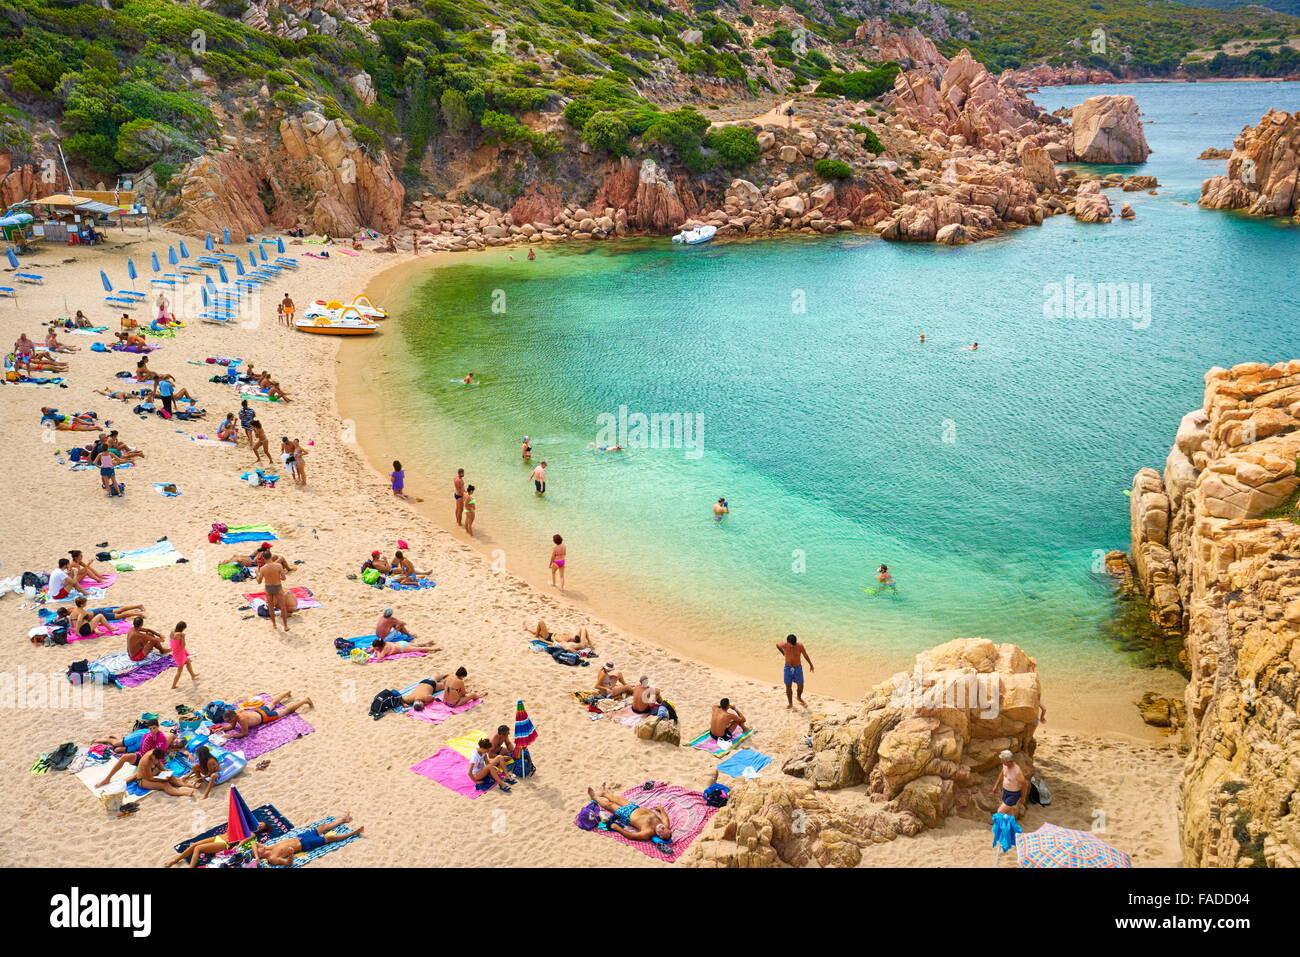 Sardinia Island - Costa Paradiso Beach, Italy - Stock Image